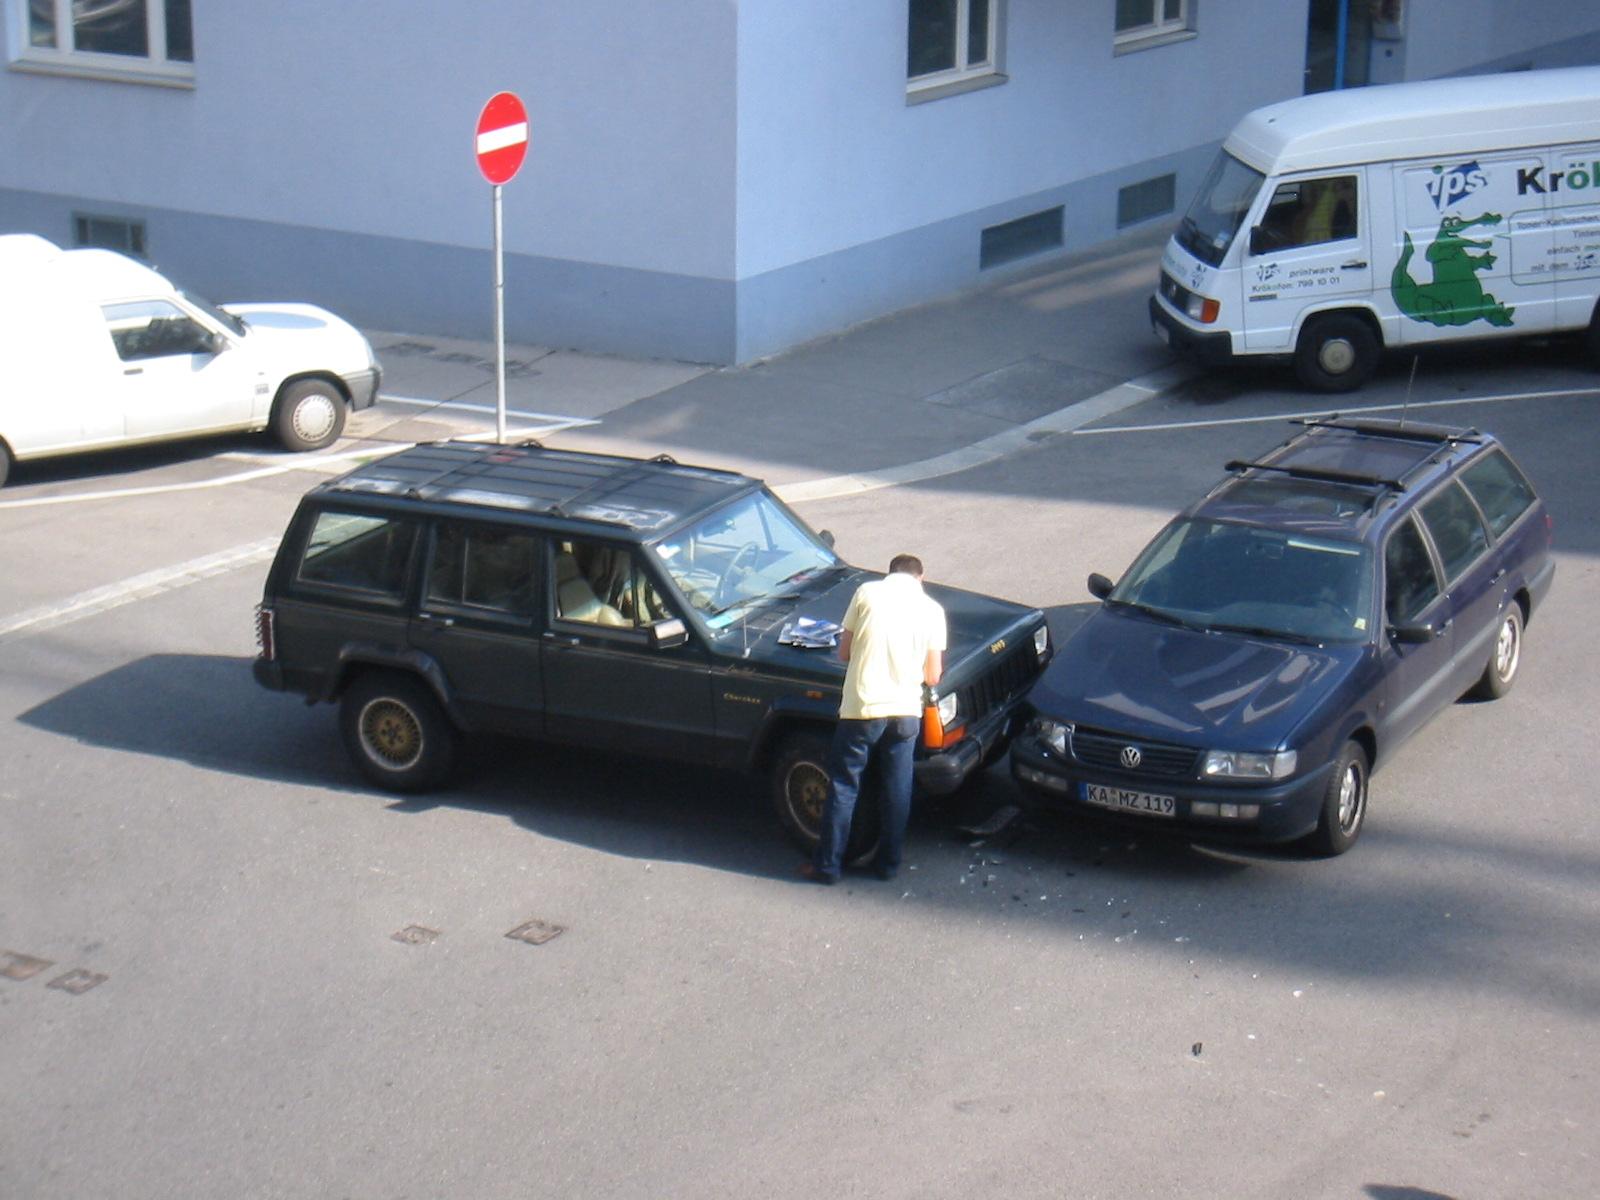 File Vw Passat And Jeep Xj Crashed Jpg Wikimedia Commons